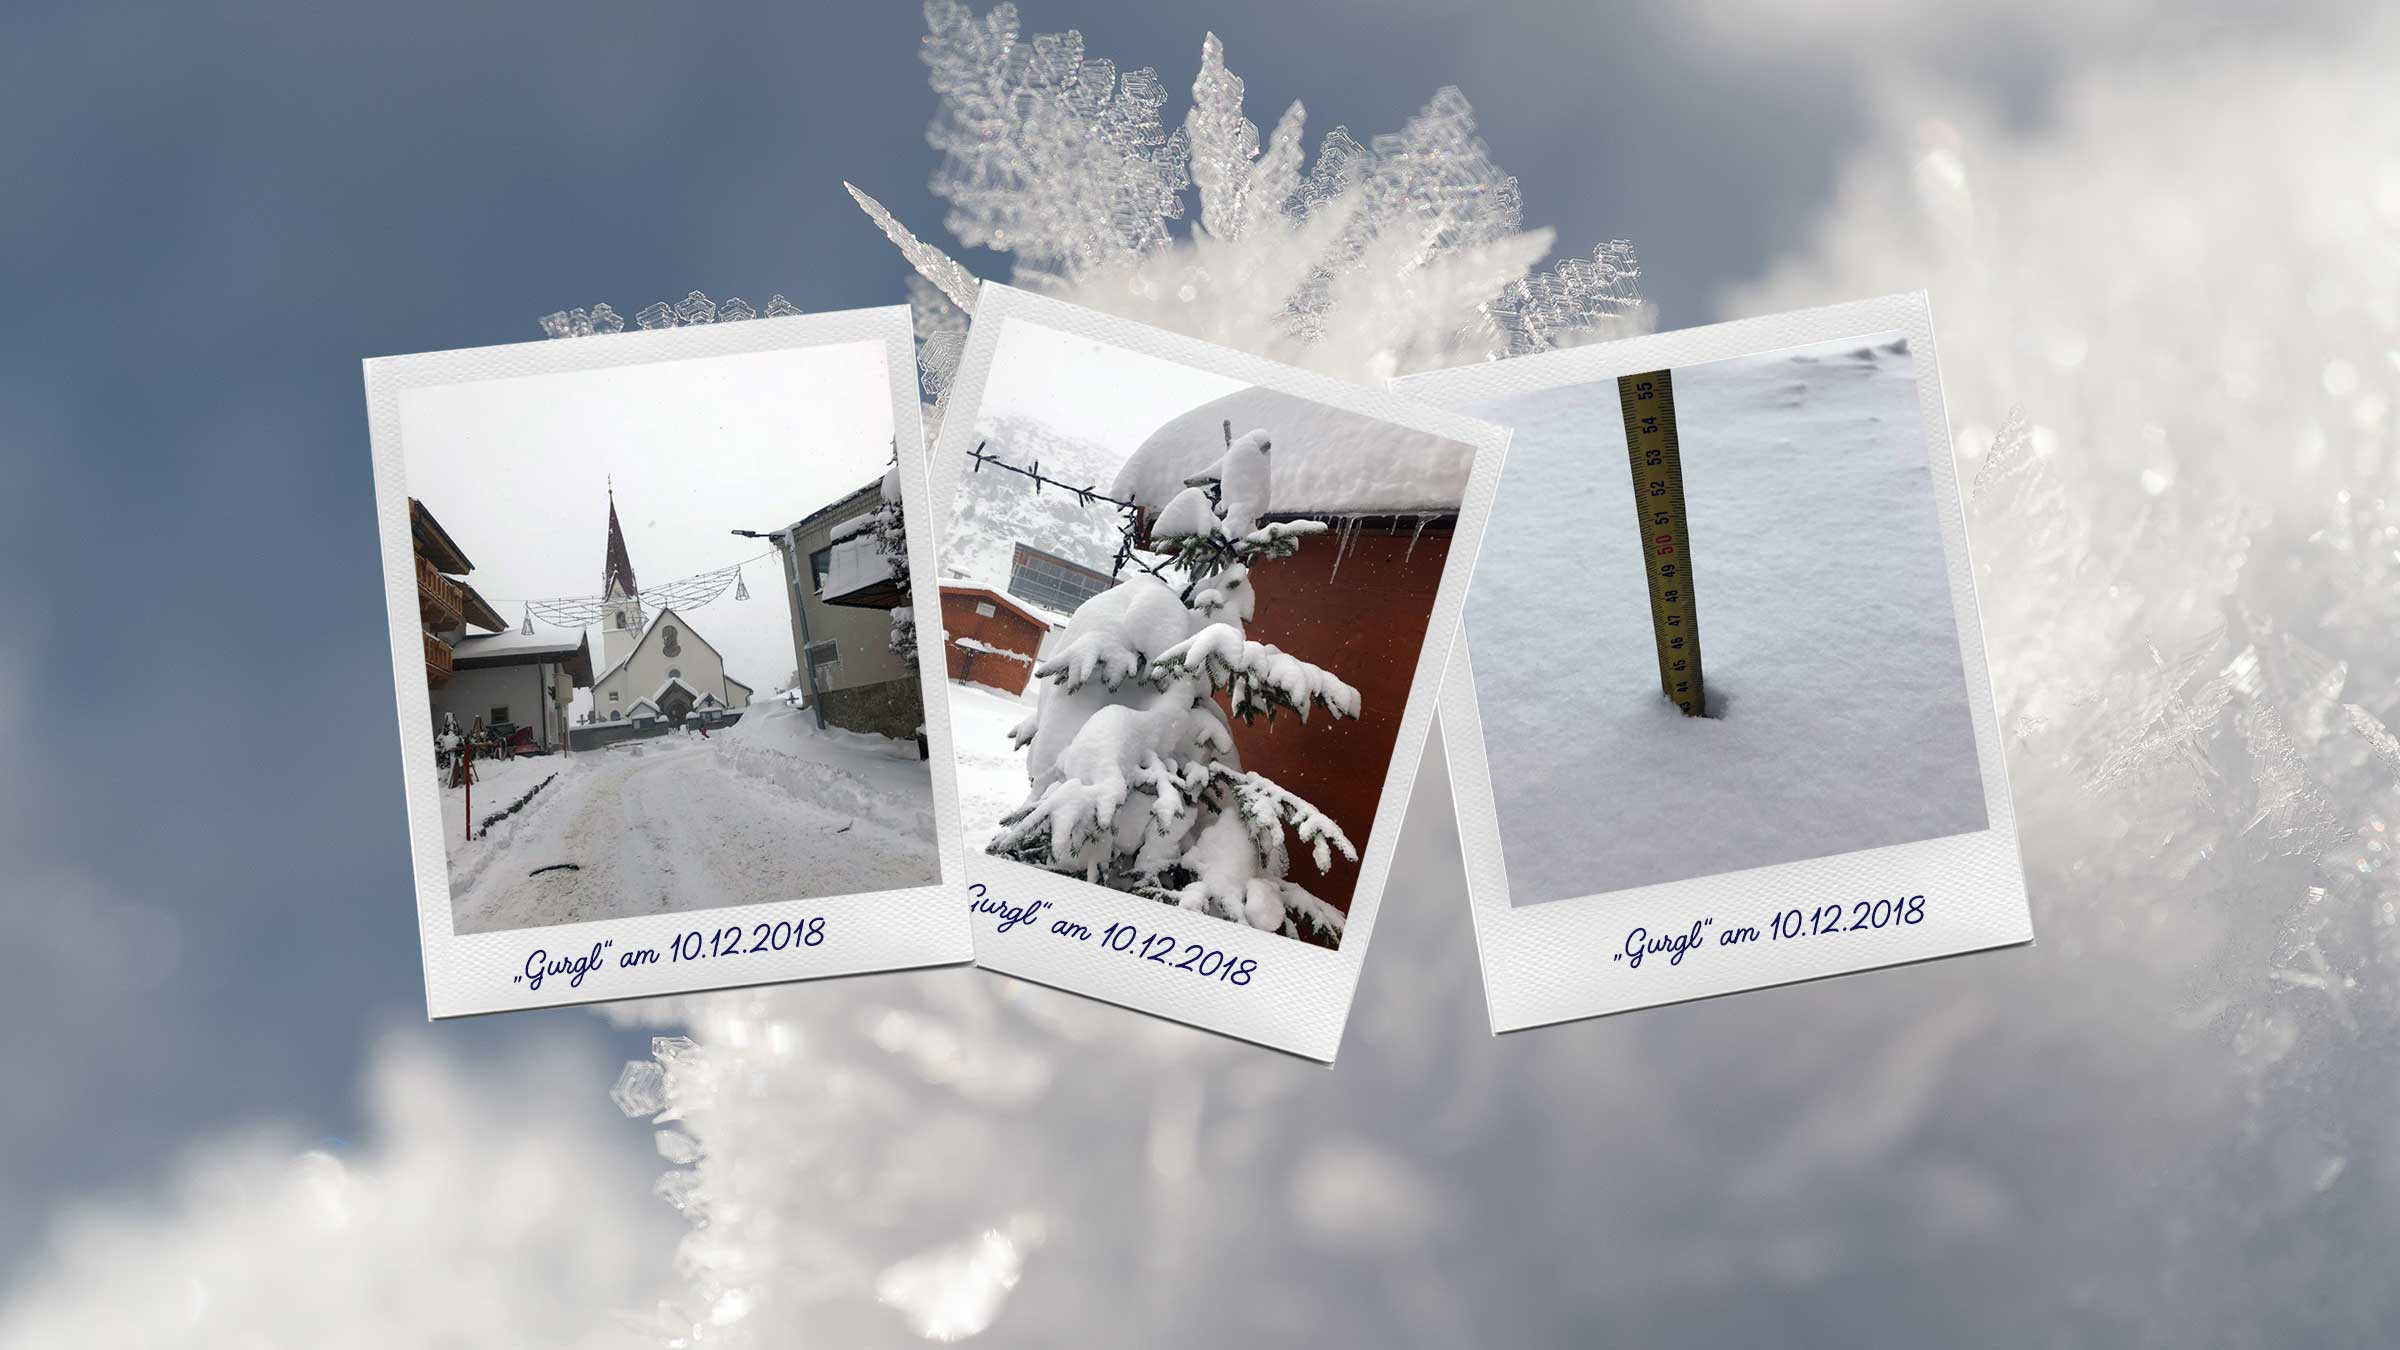 Snow-Update aus Obergurgl-Hochgurgl vom 10. Dez. 2018